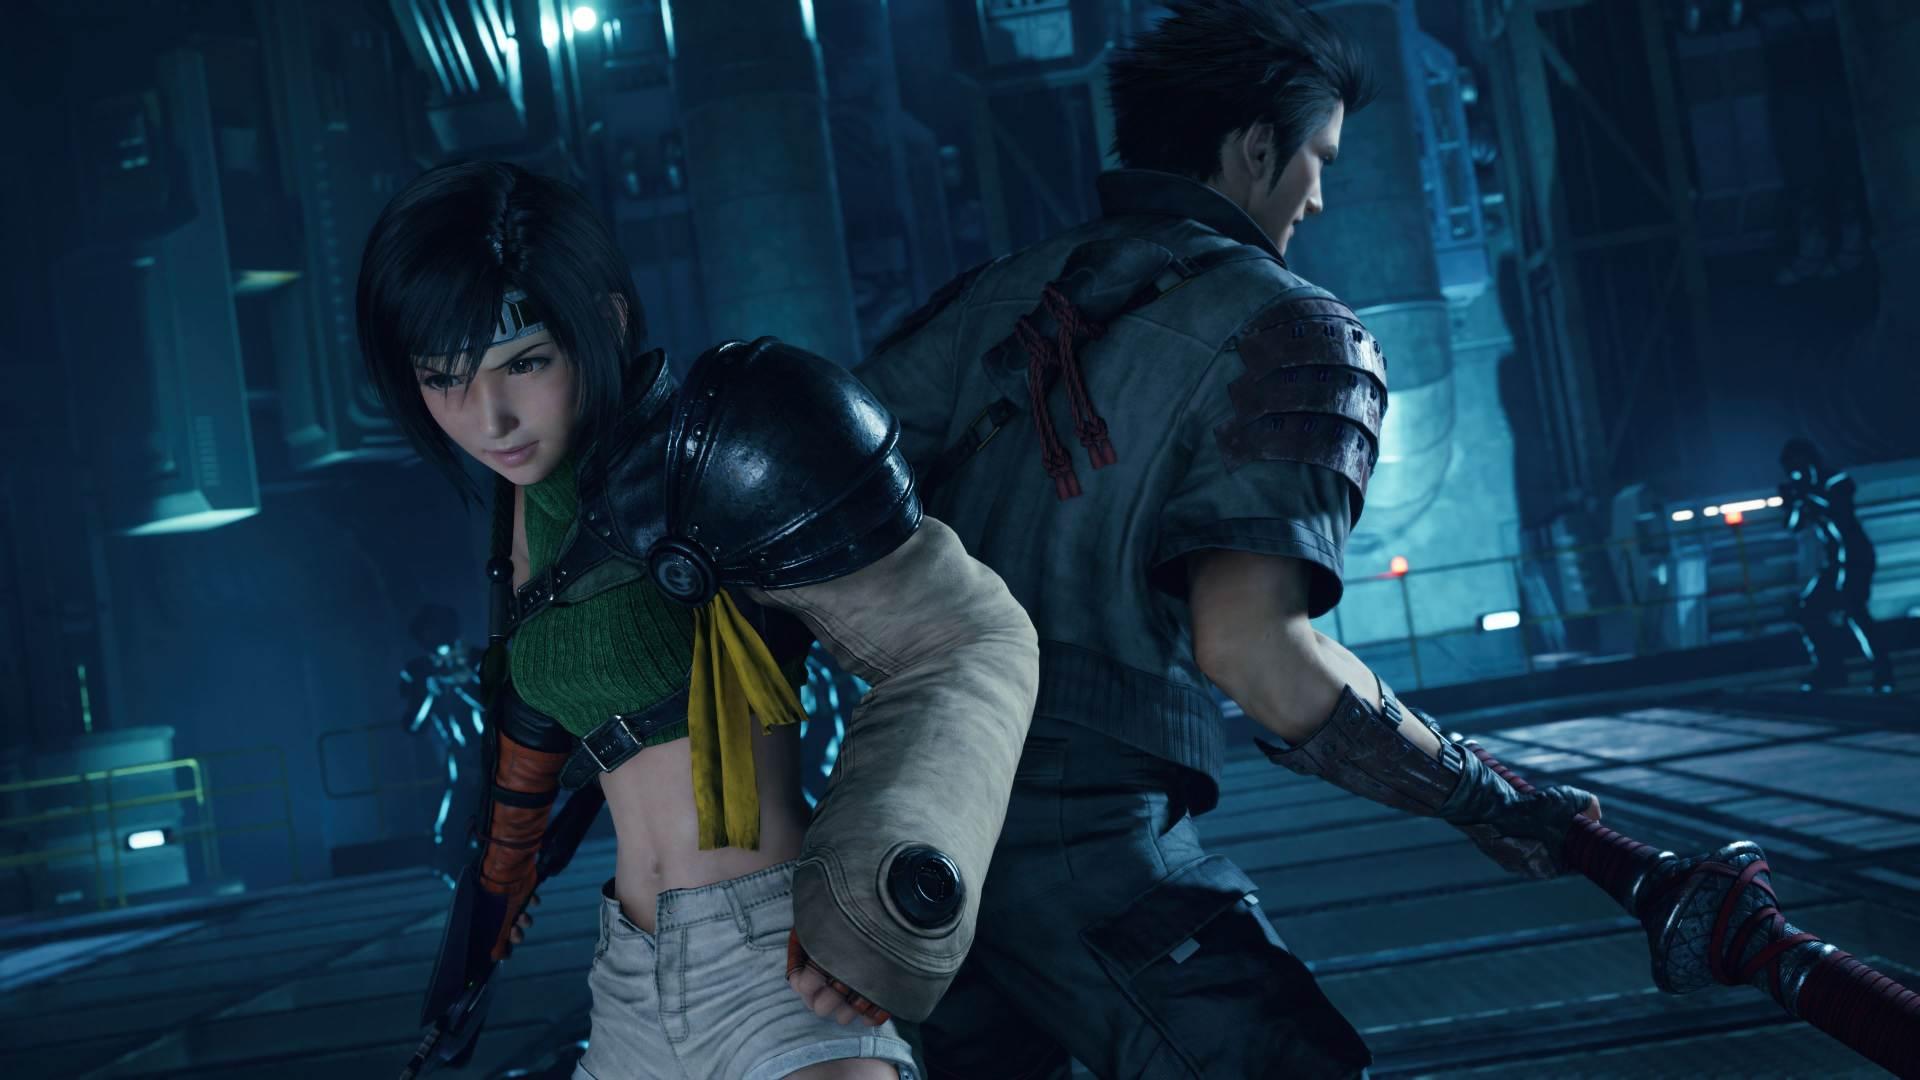 Square Enix confirms it has plans for E3 2021 screenshot